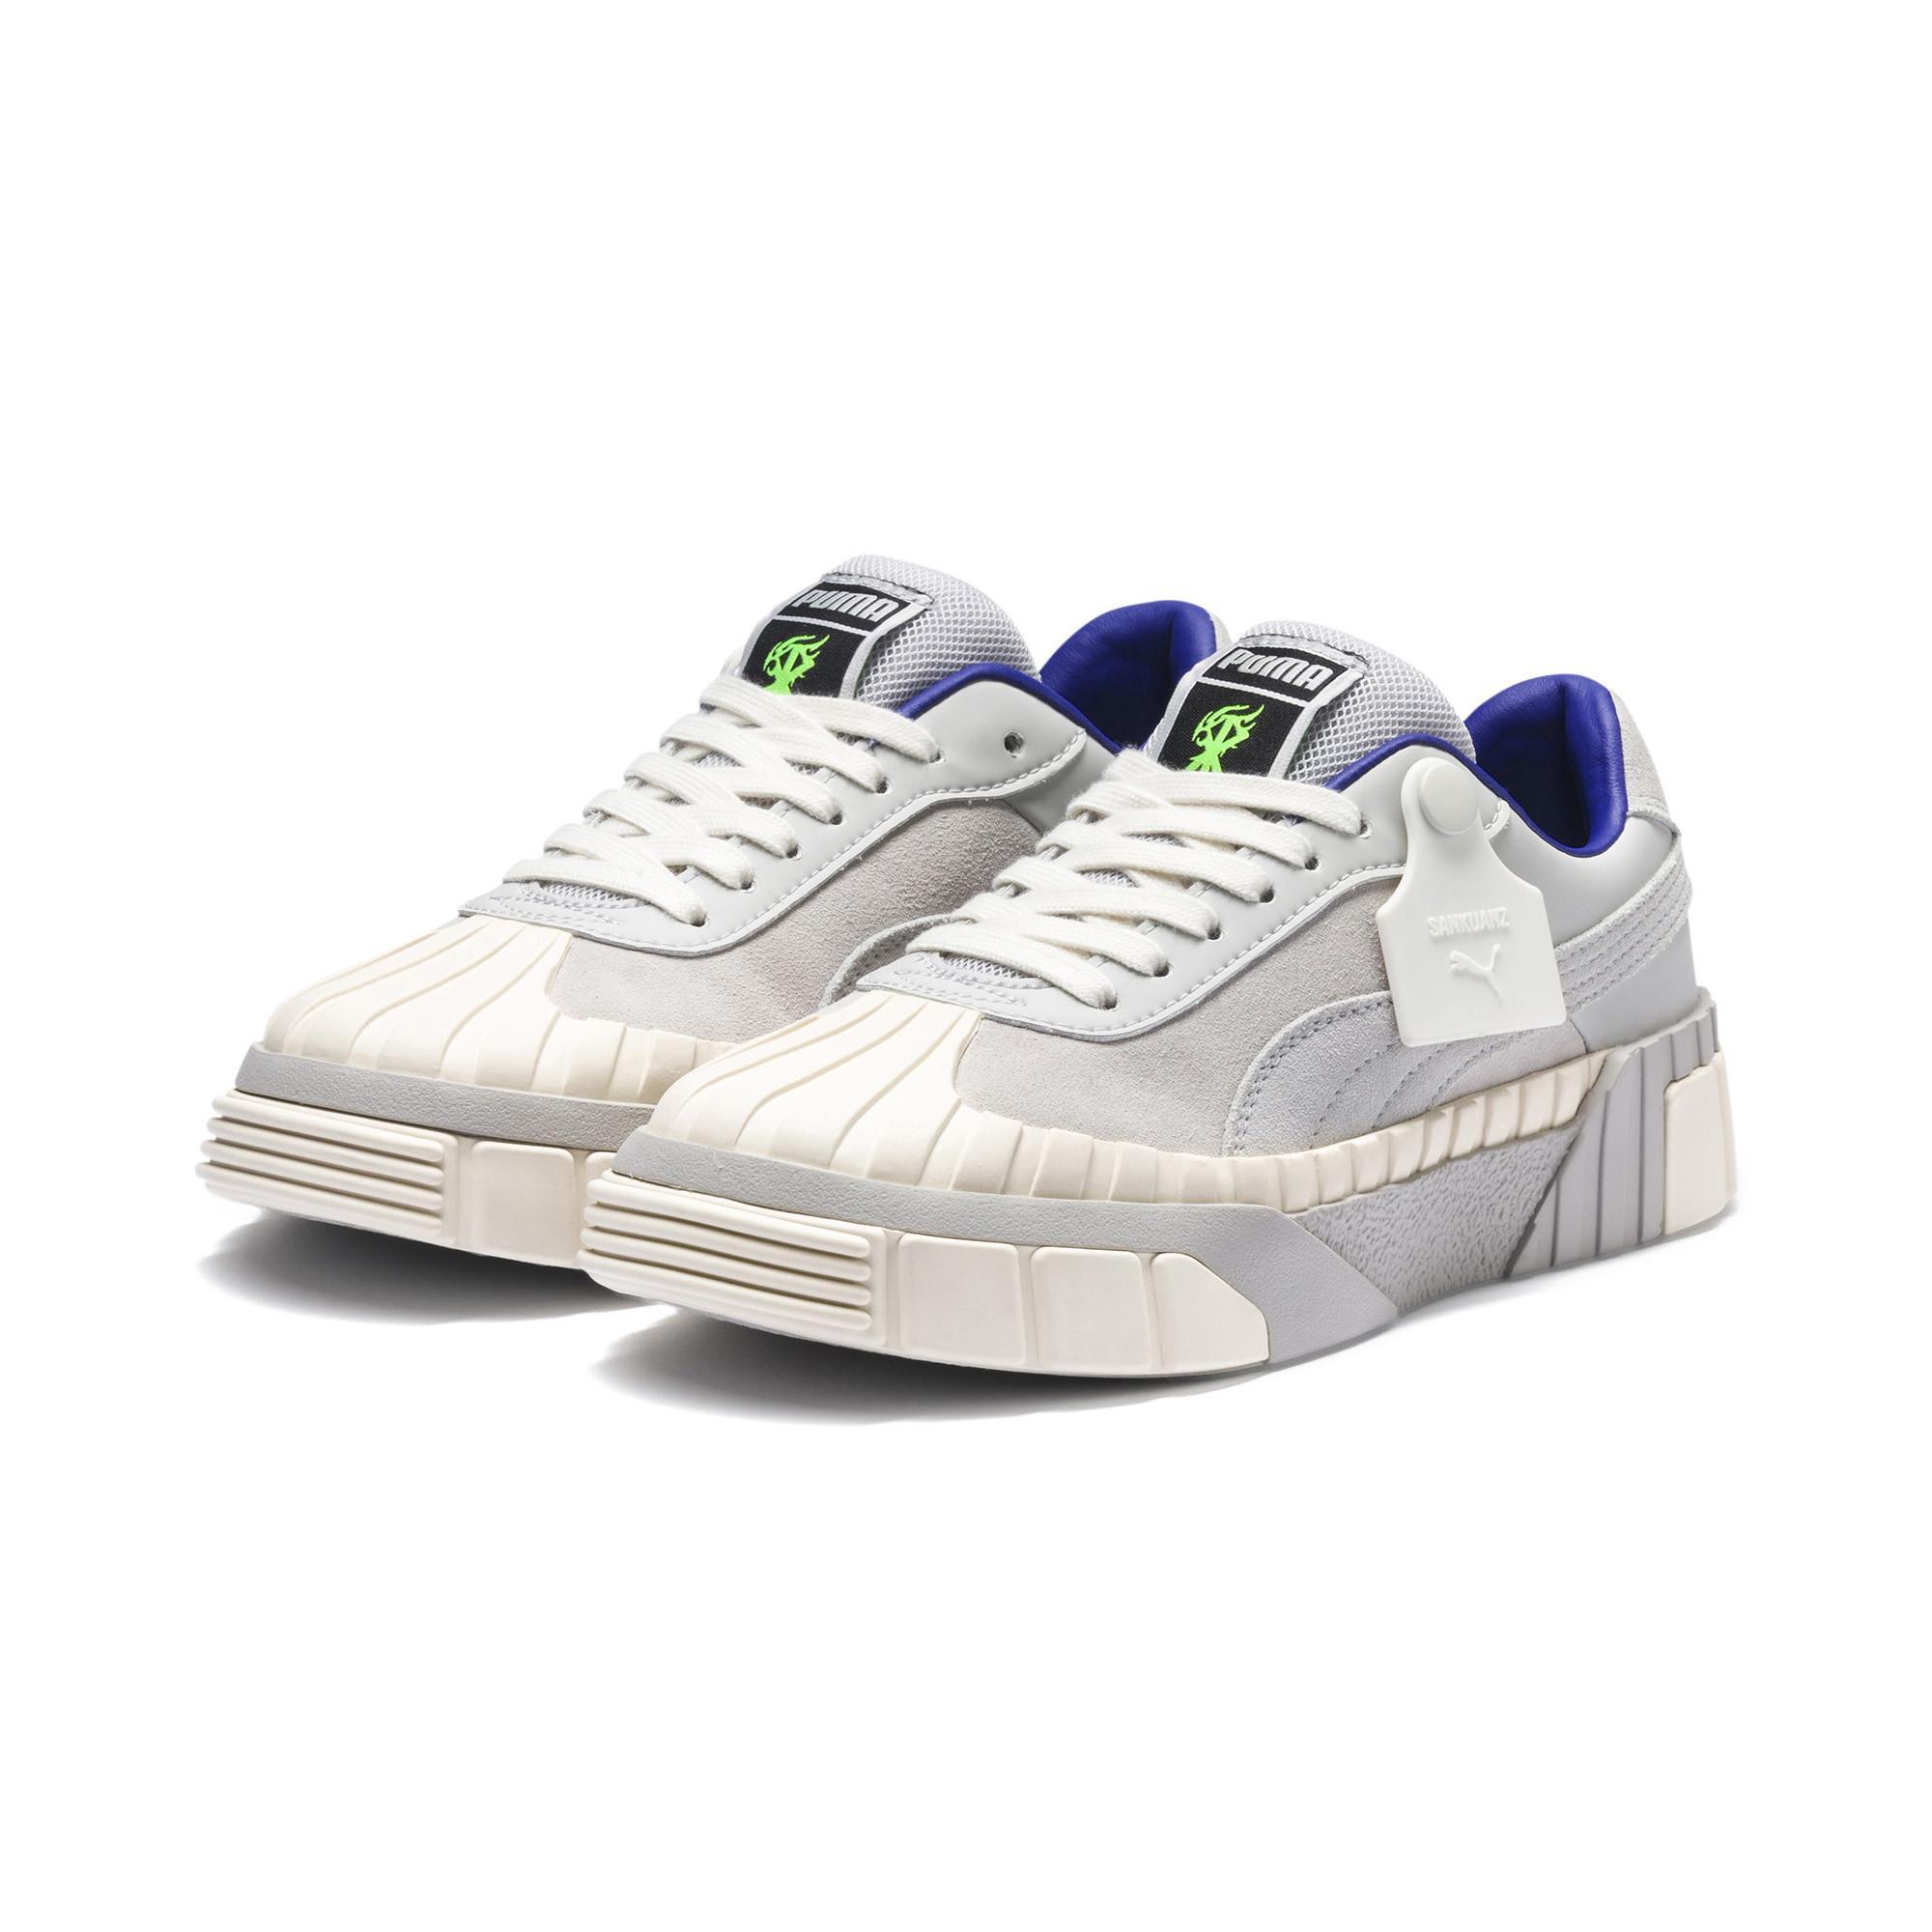 PUMA White Cali Sankuanz Women's Sneakers for men